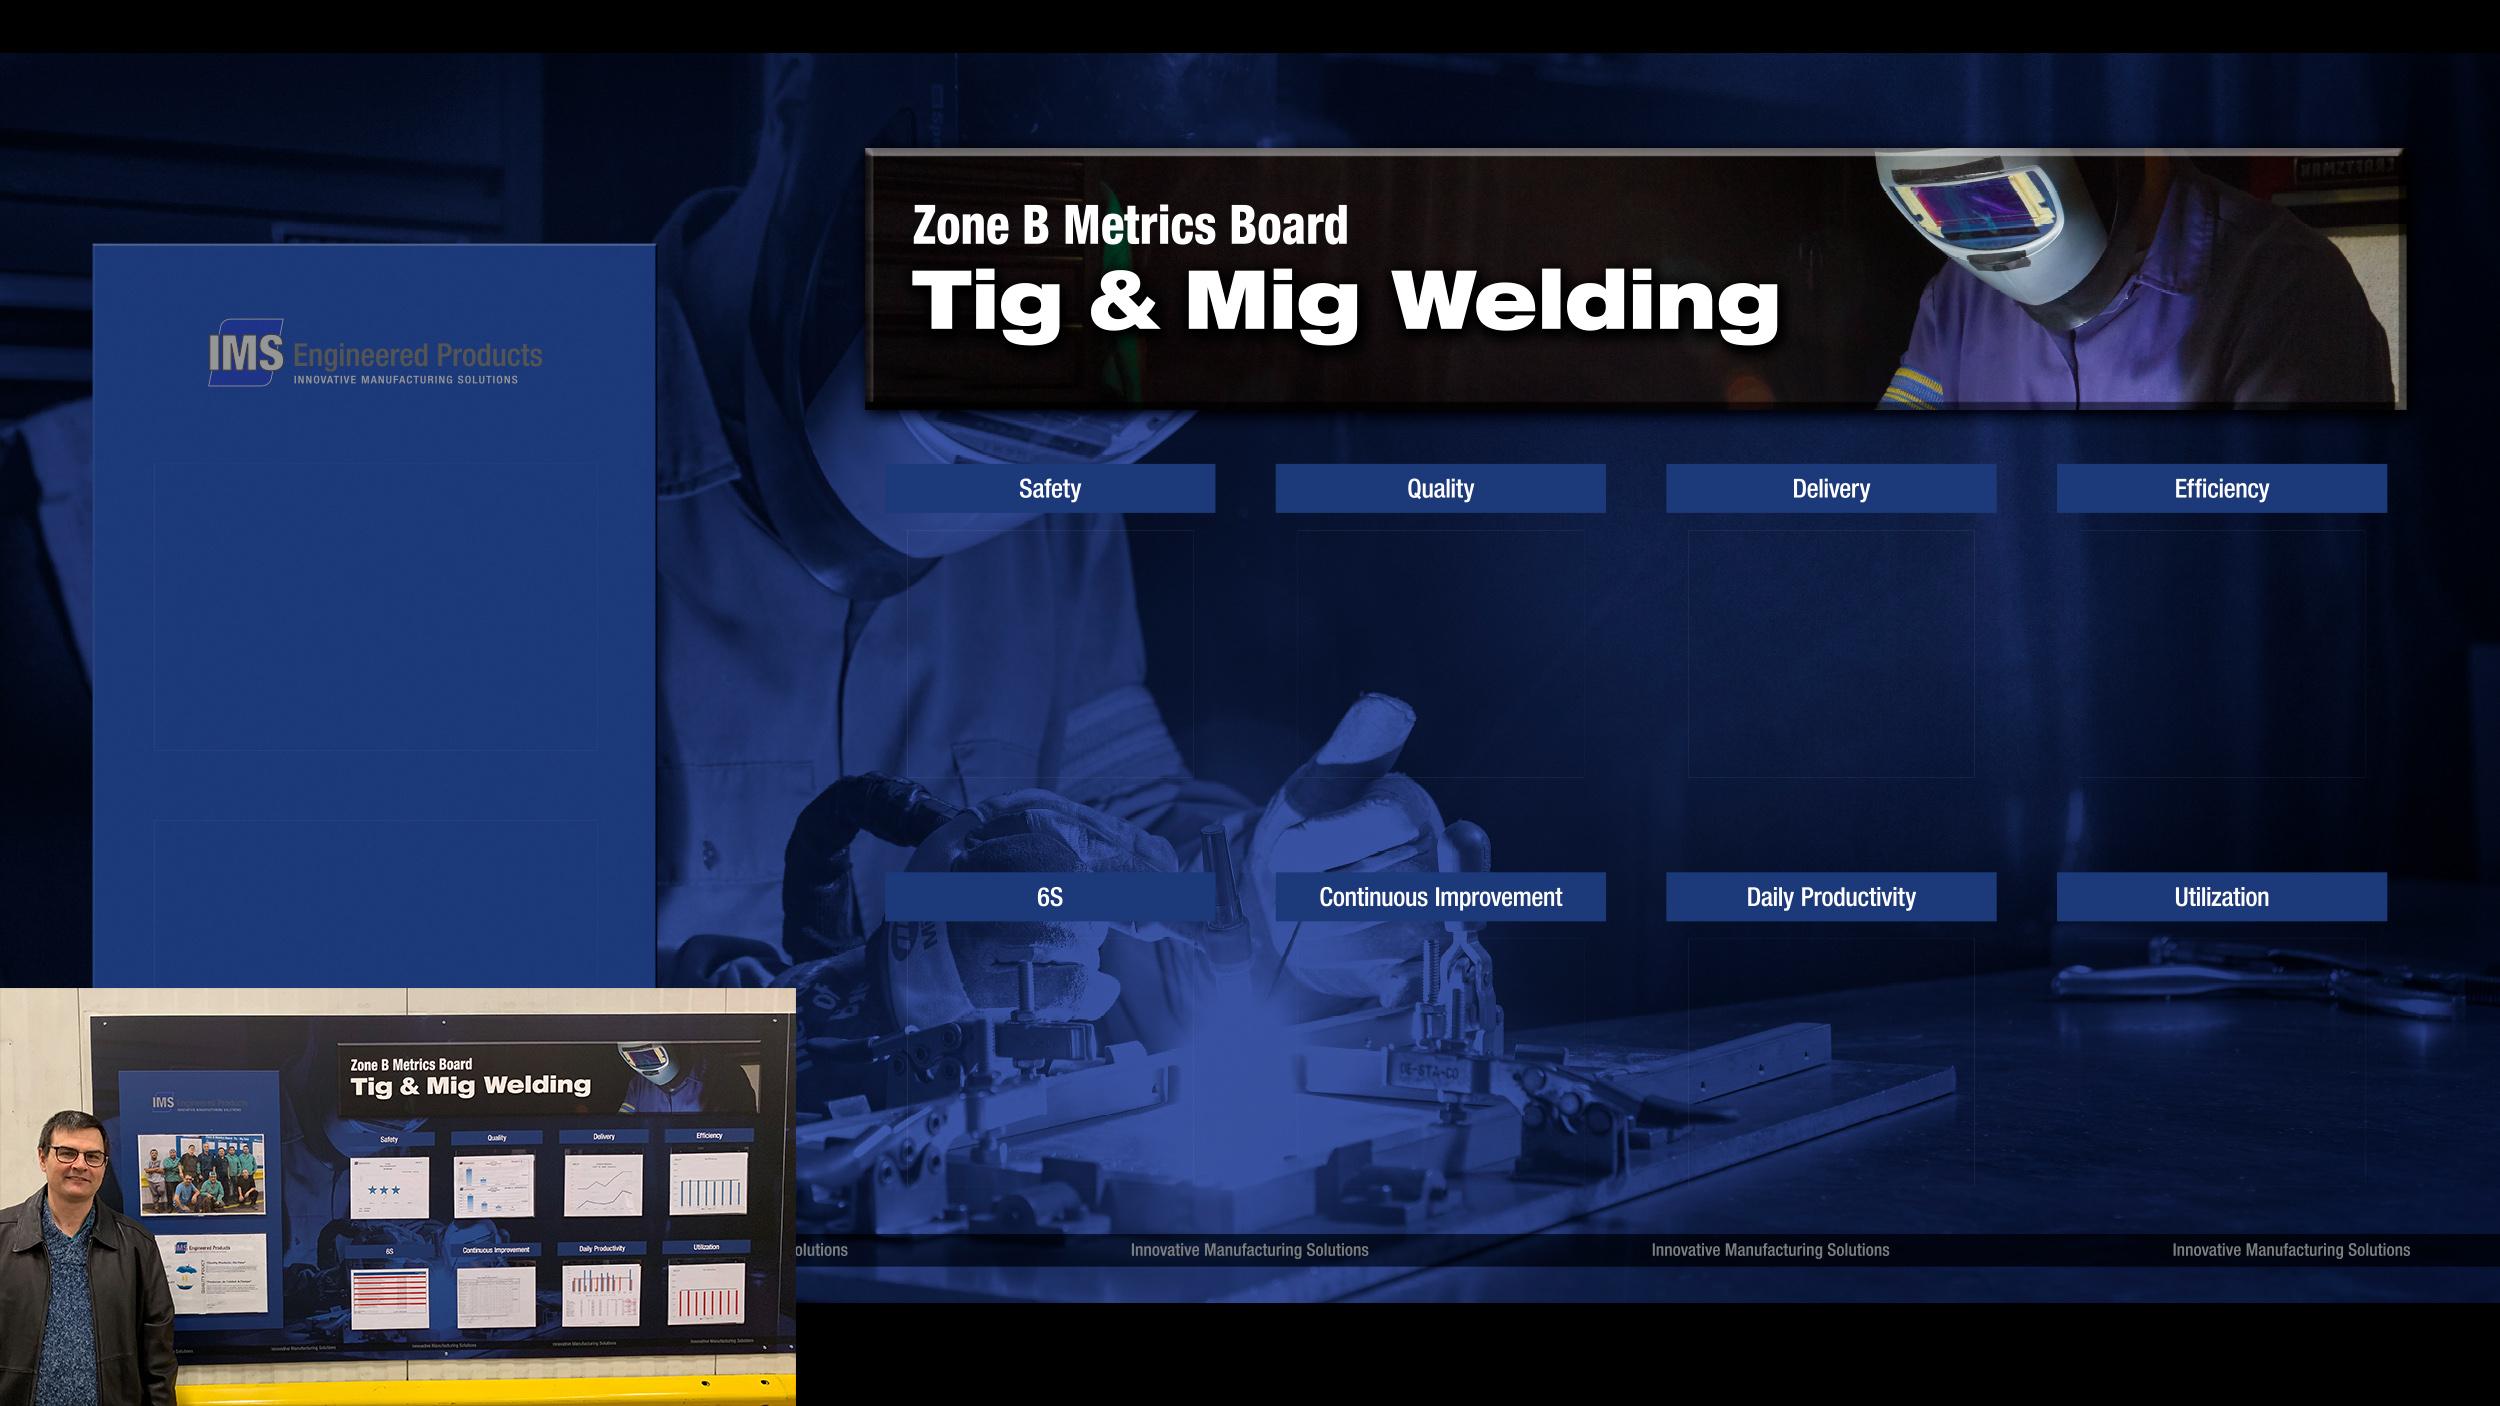 metric-board-tig-mig-weldEnvironmental-Large-Format-design.jpg